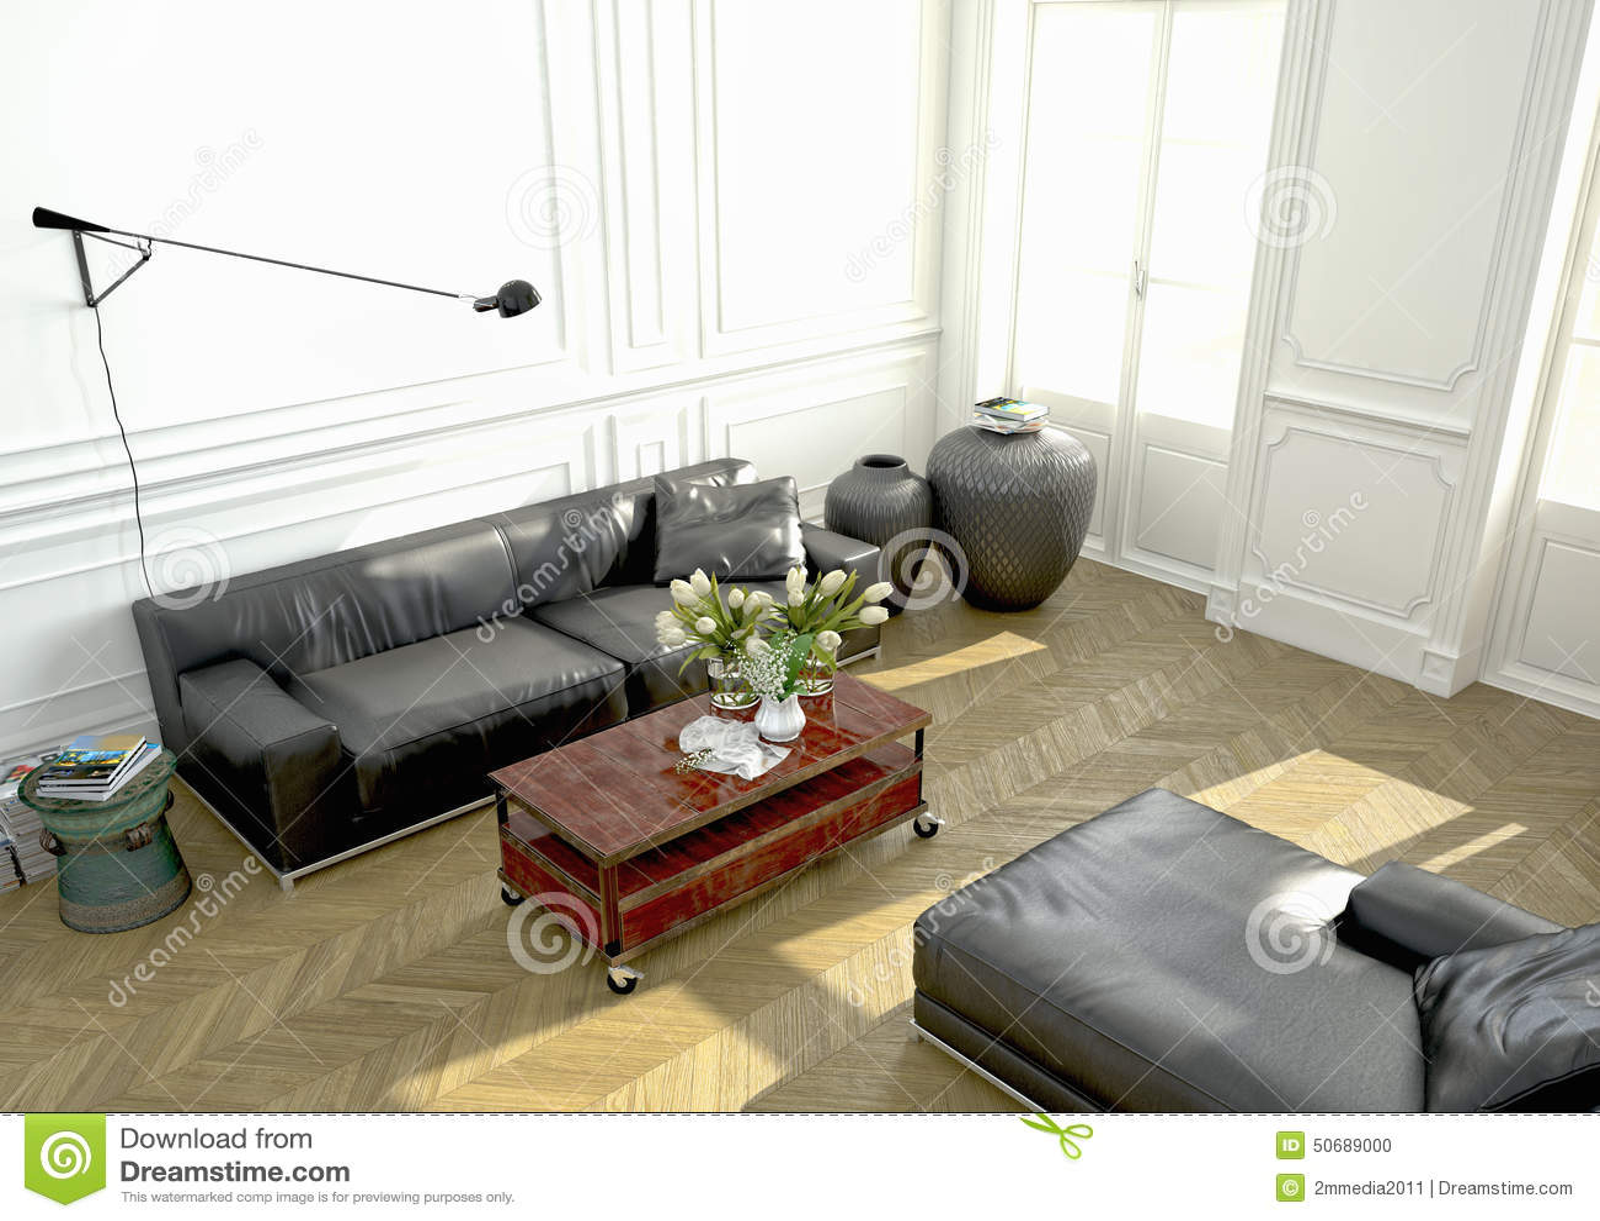 Download 室内设计,客厅 3d翻译 库存照片. 图片 包括有 没人, 内部, 木条地板, 国内, 生活方式, 居住 - 50689000